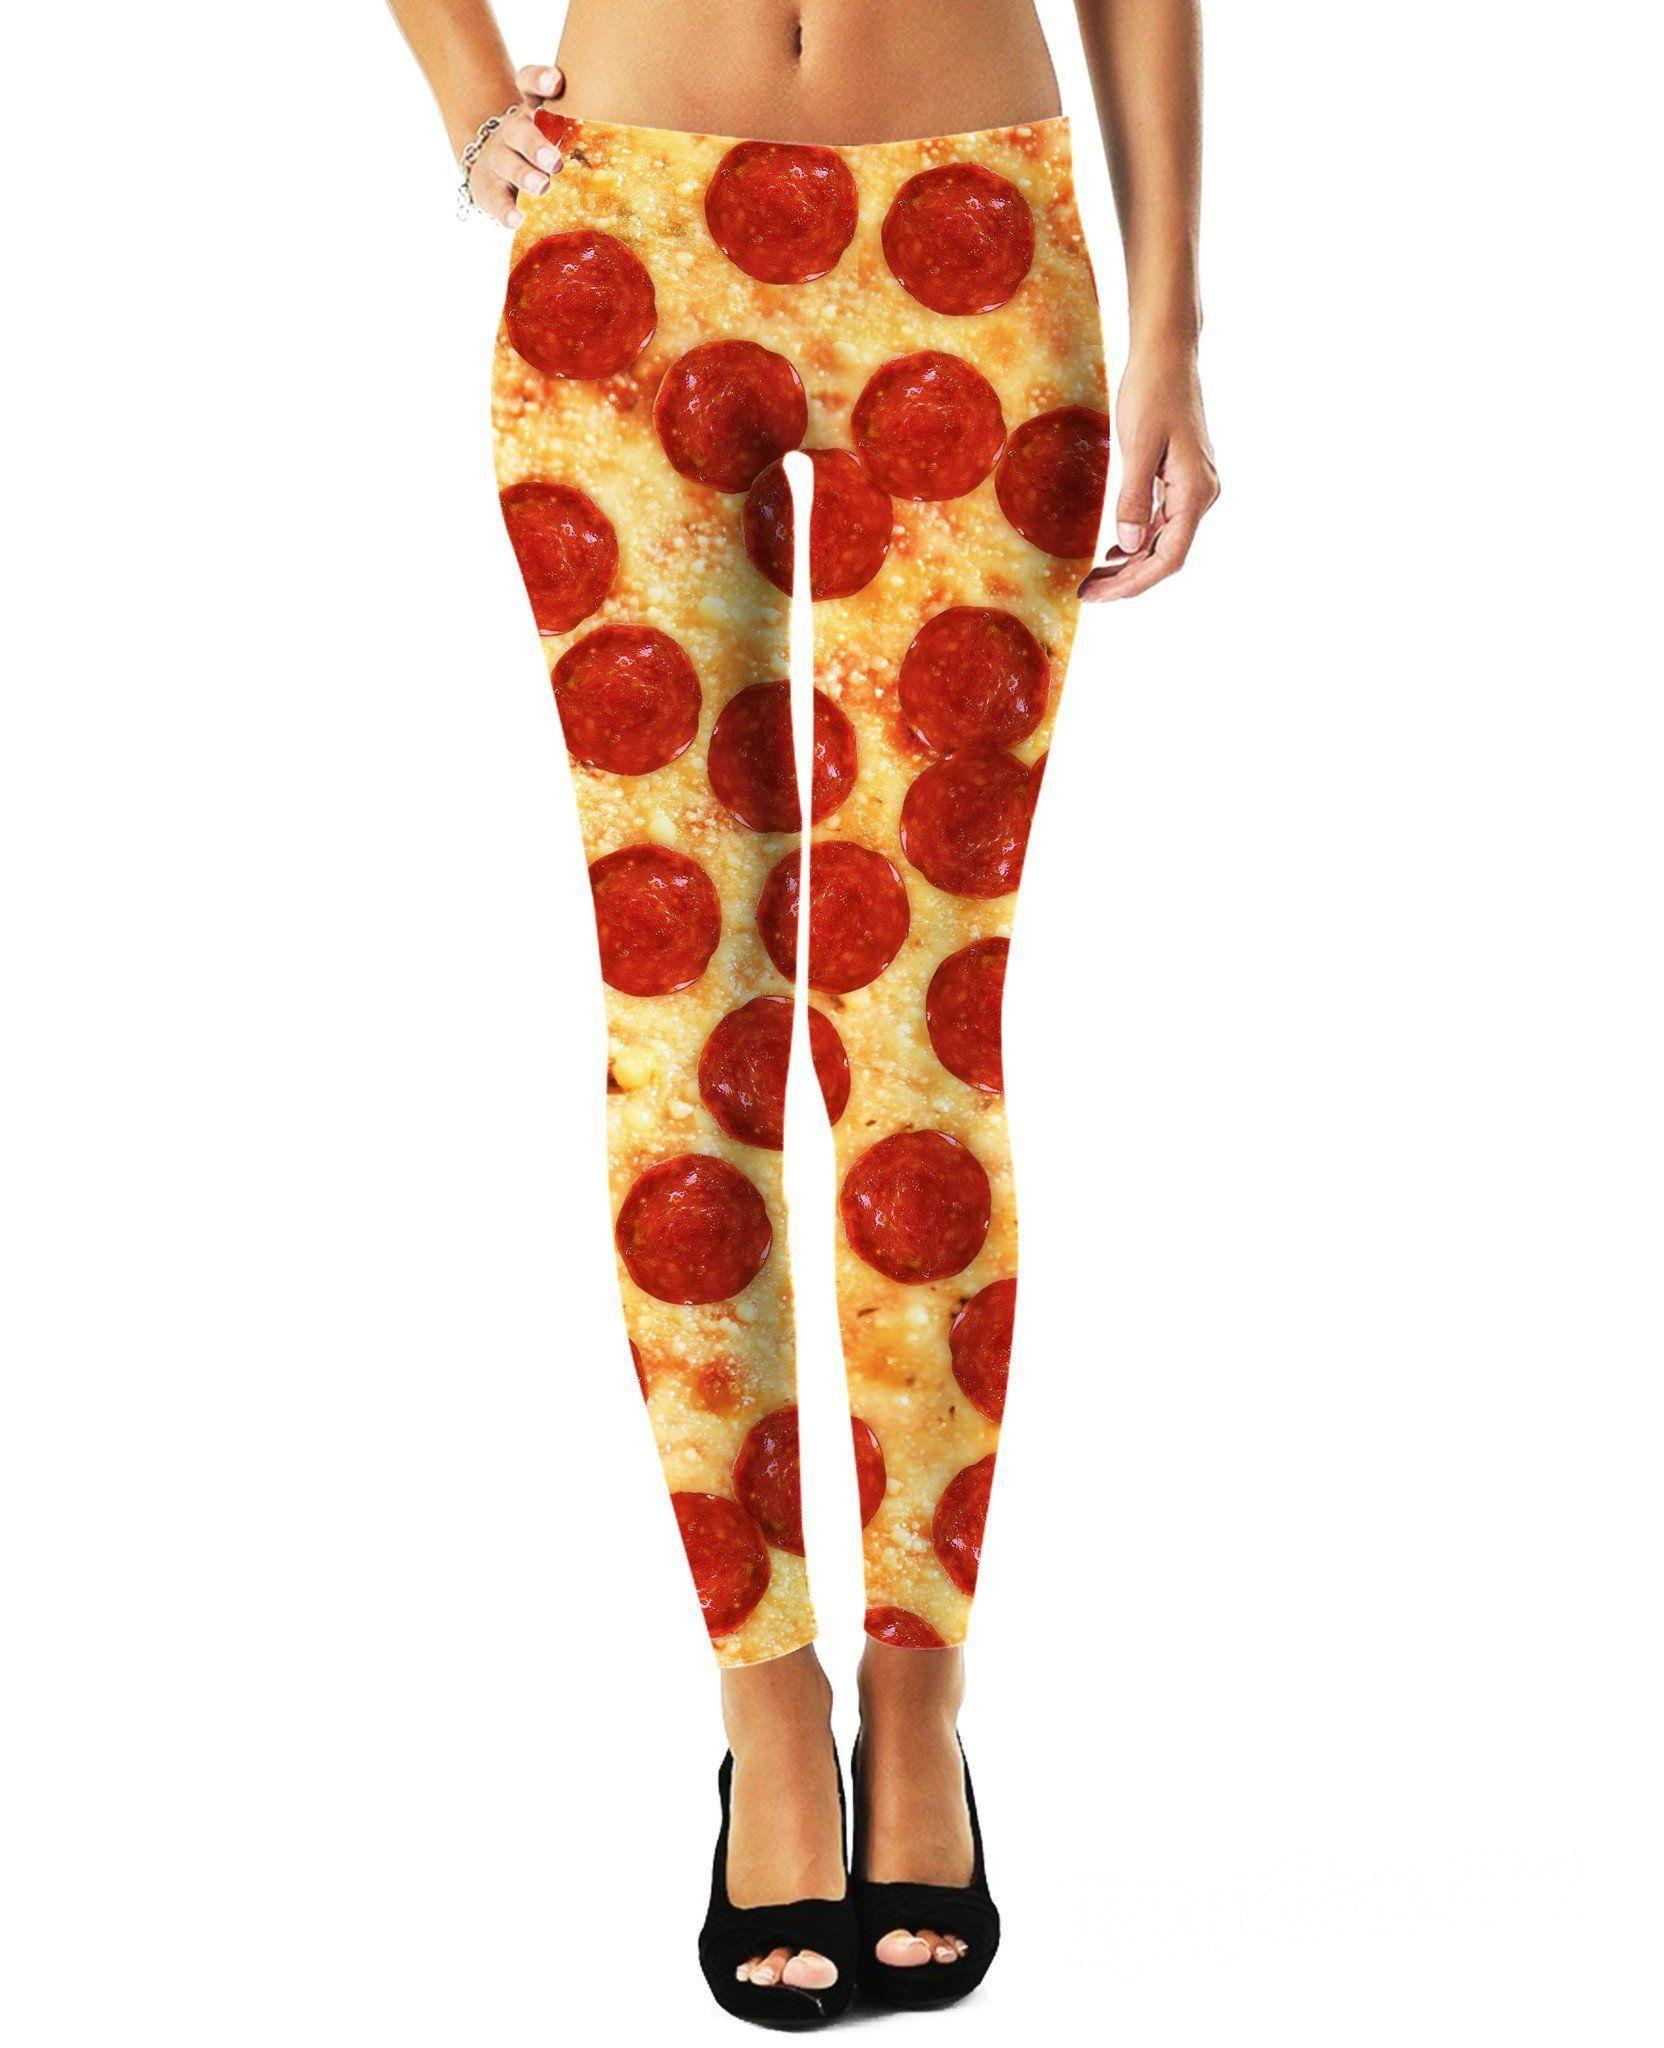 b8a01fea5205a5 Pizza Leggings   Products   Pizza leggings, Leggings, Printed leggings